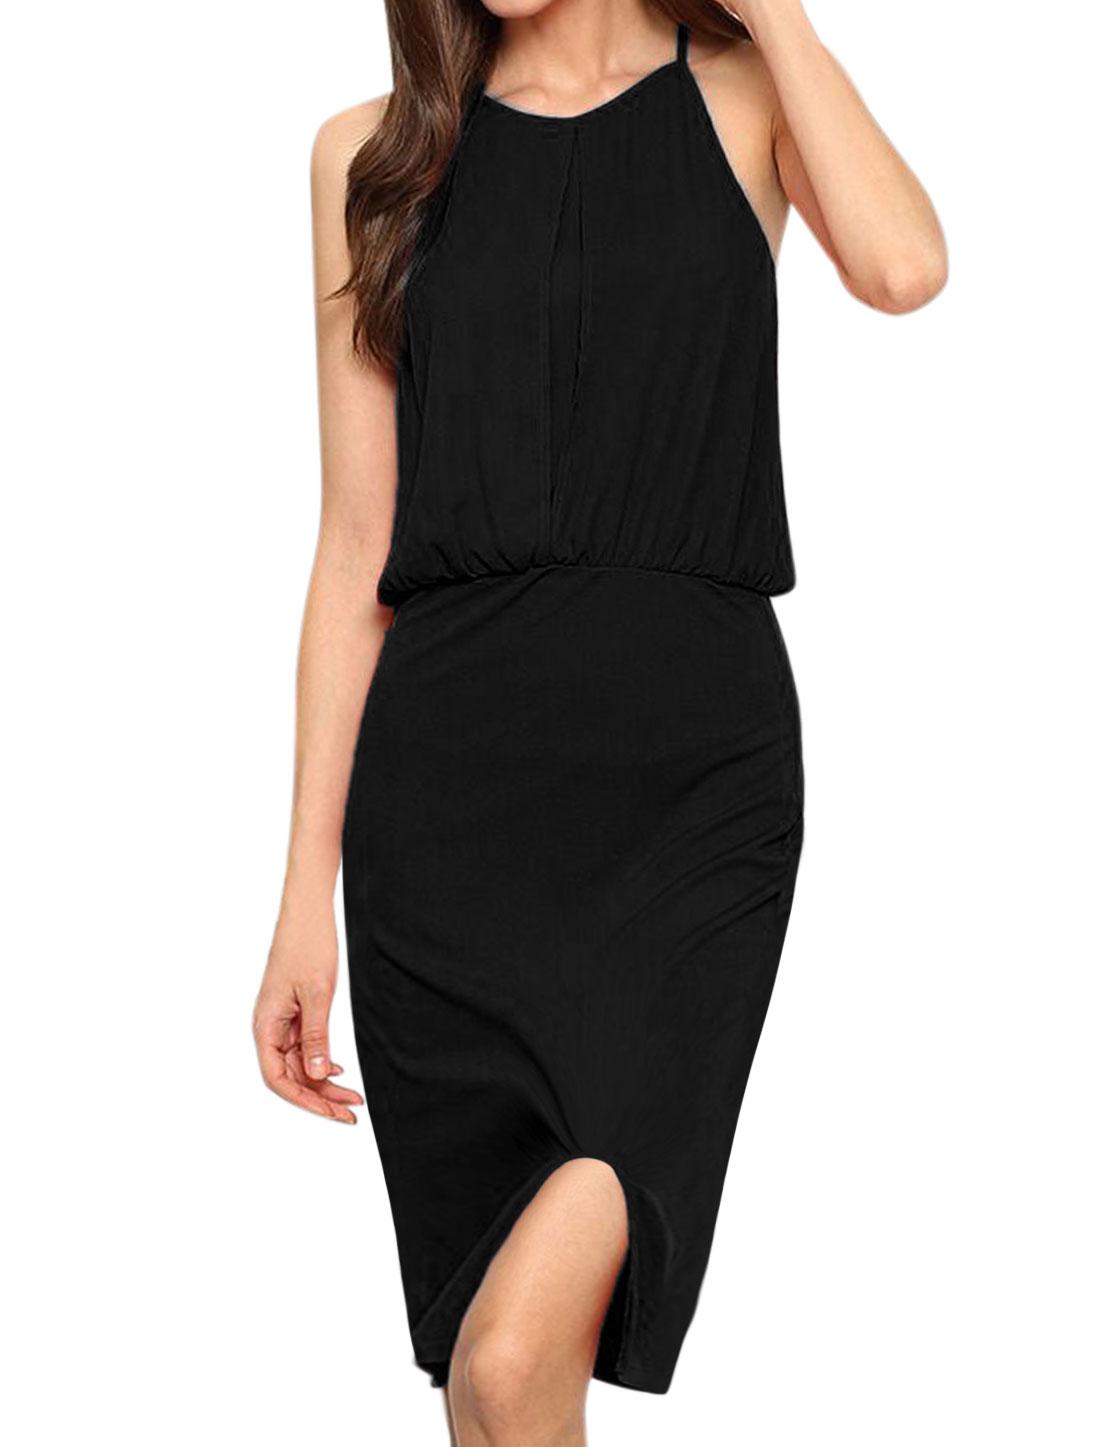 Women Inverted-Pleat Slit Front Elastic Waist Blouson Dress Black M